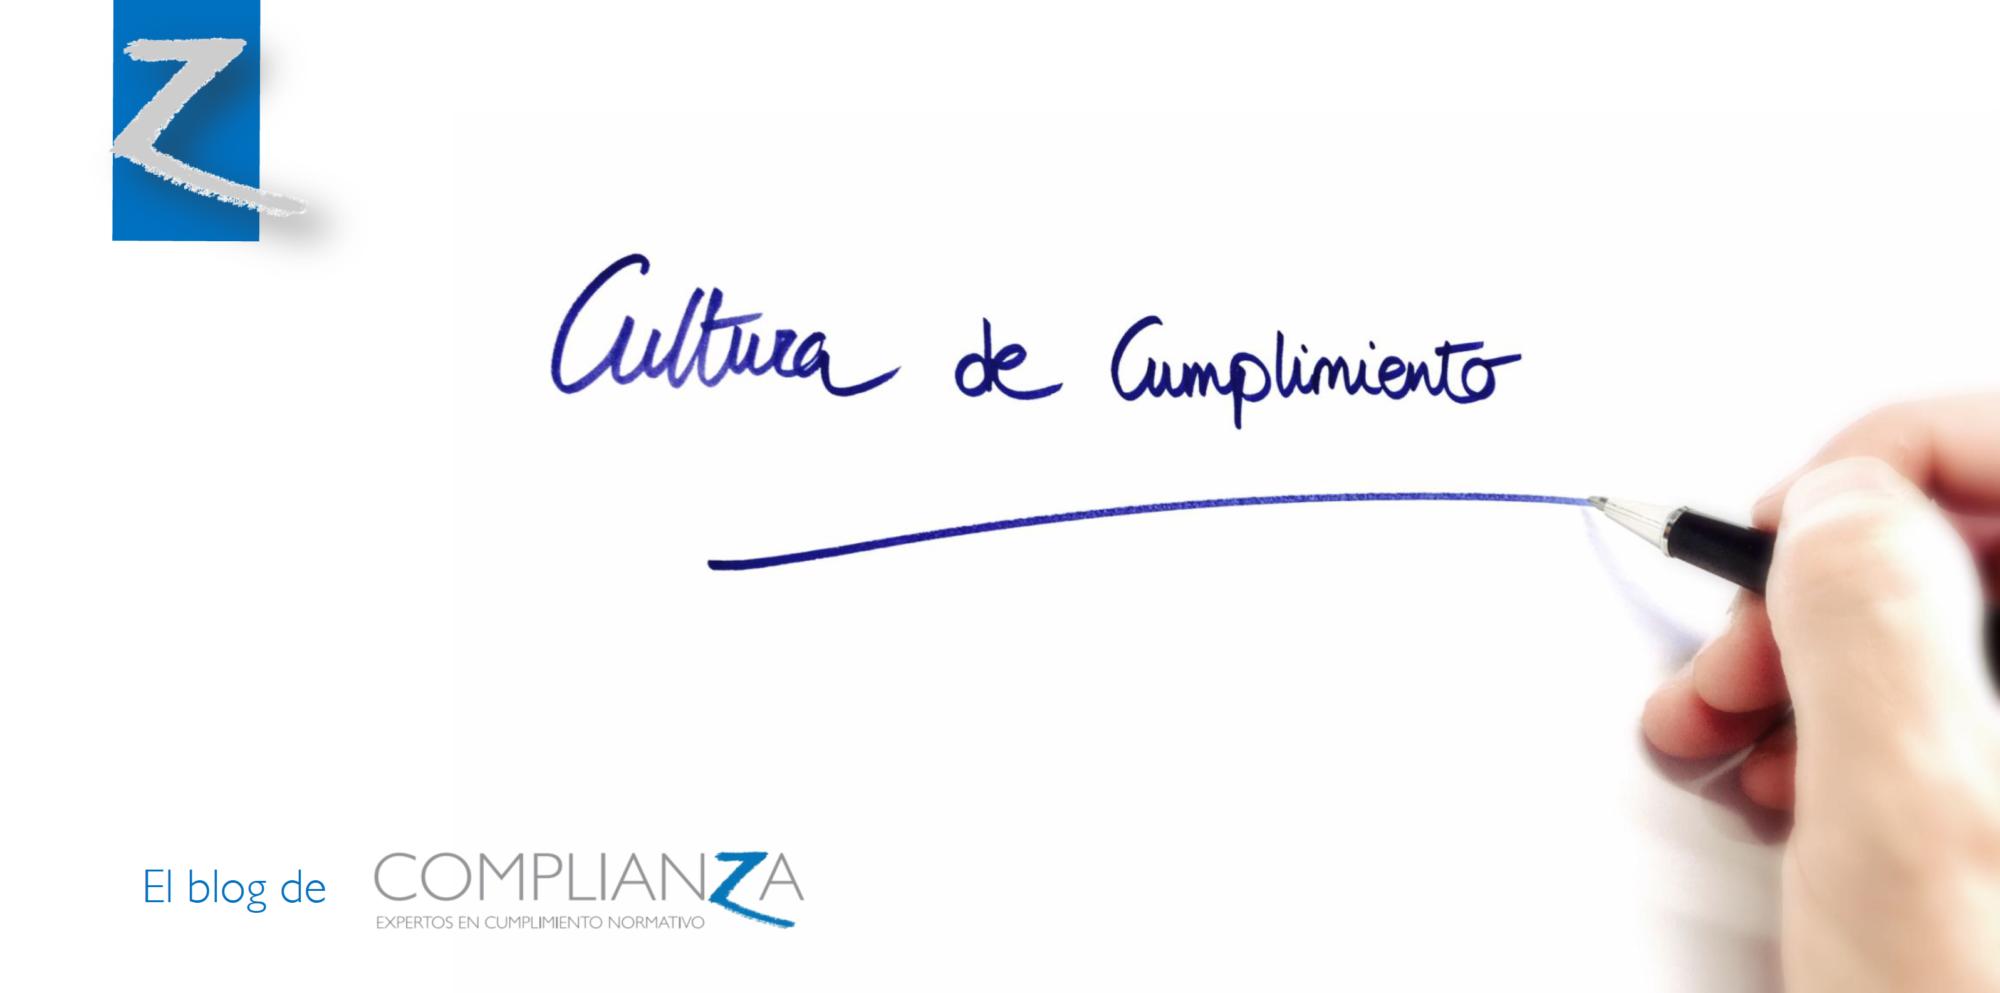 CULTURA DE CUMPLIMIENTO